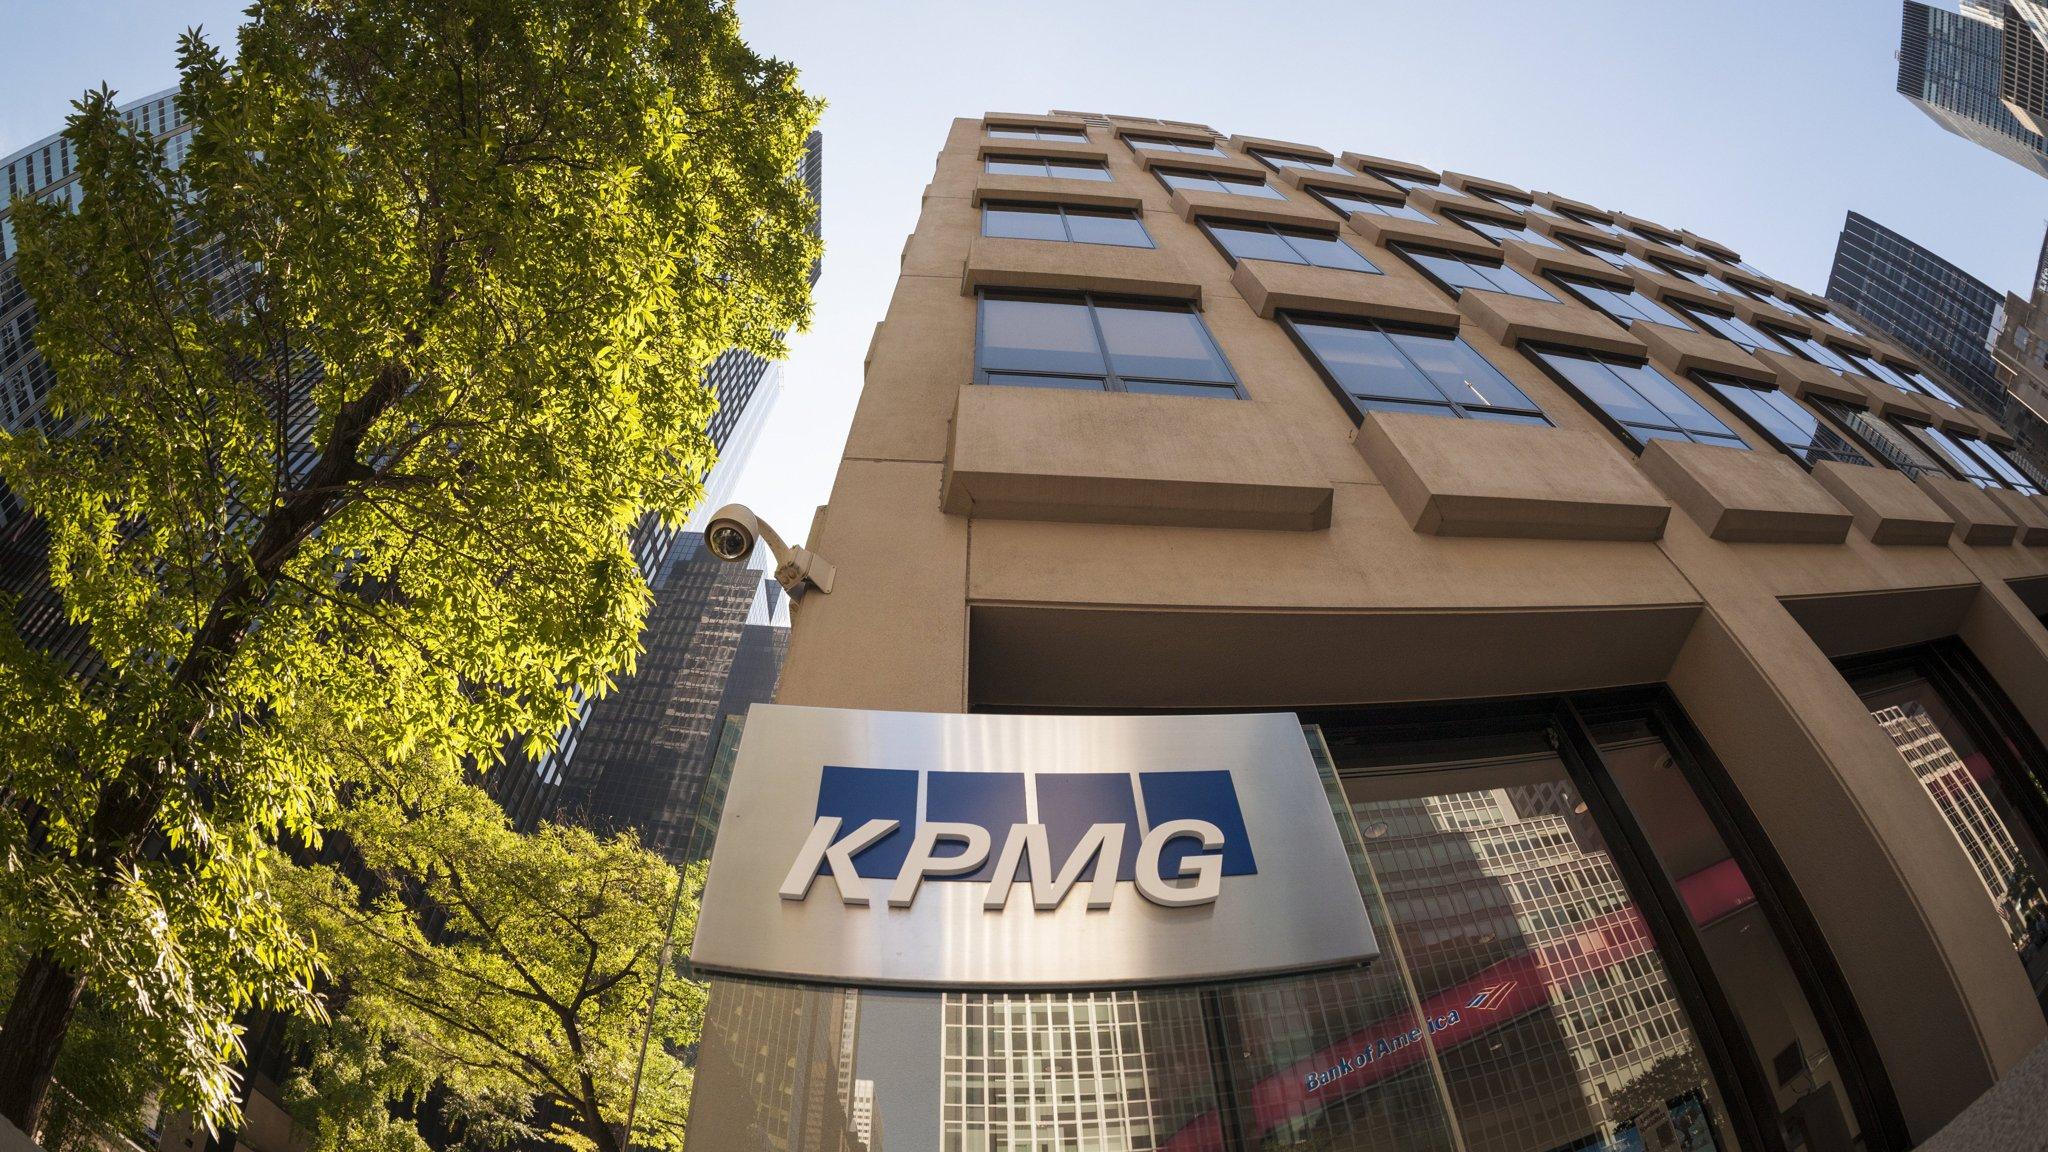 KPMG South Africa executives dismissed over Gupta scandal